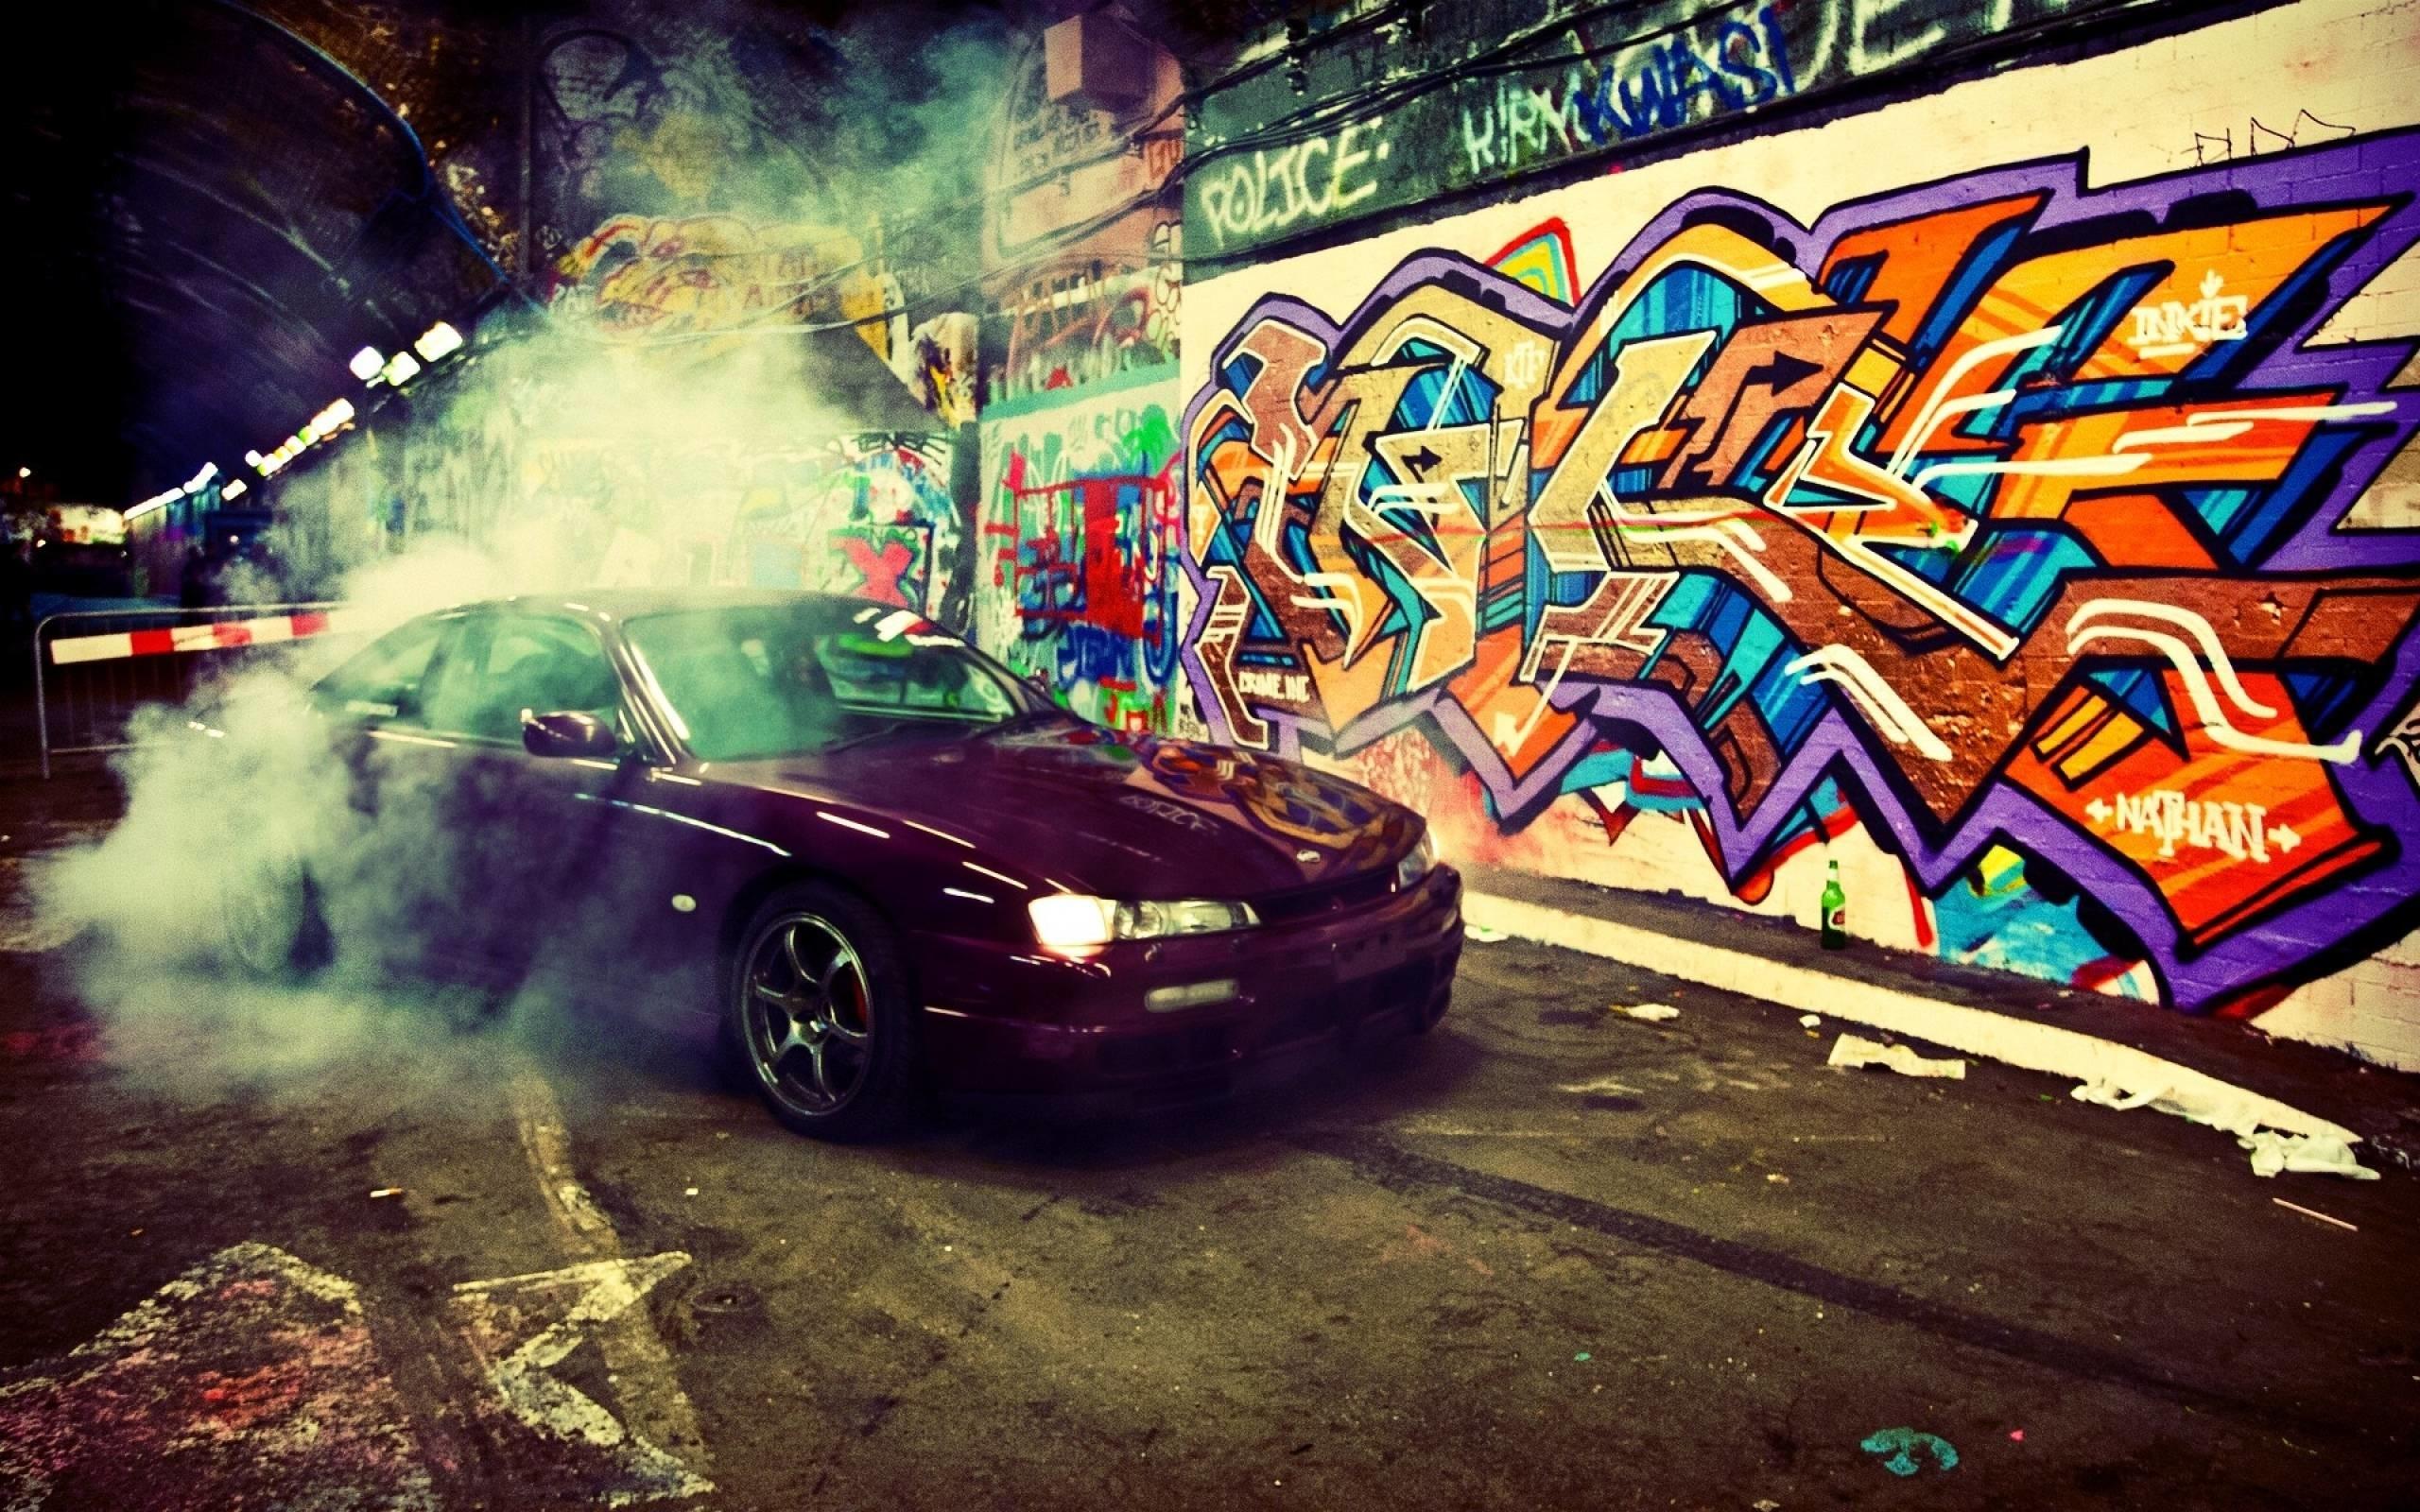 Hip hop graffiti wallpaper 55 images 2560x1600 cars smoke graffiti wallpaper graffiti wallpaper hd free voltagebd Image collections